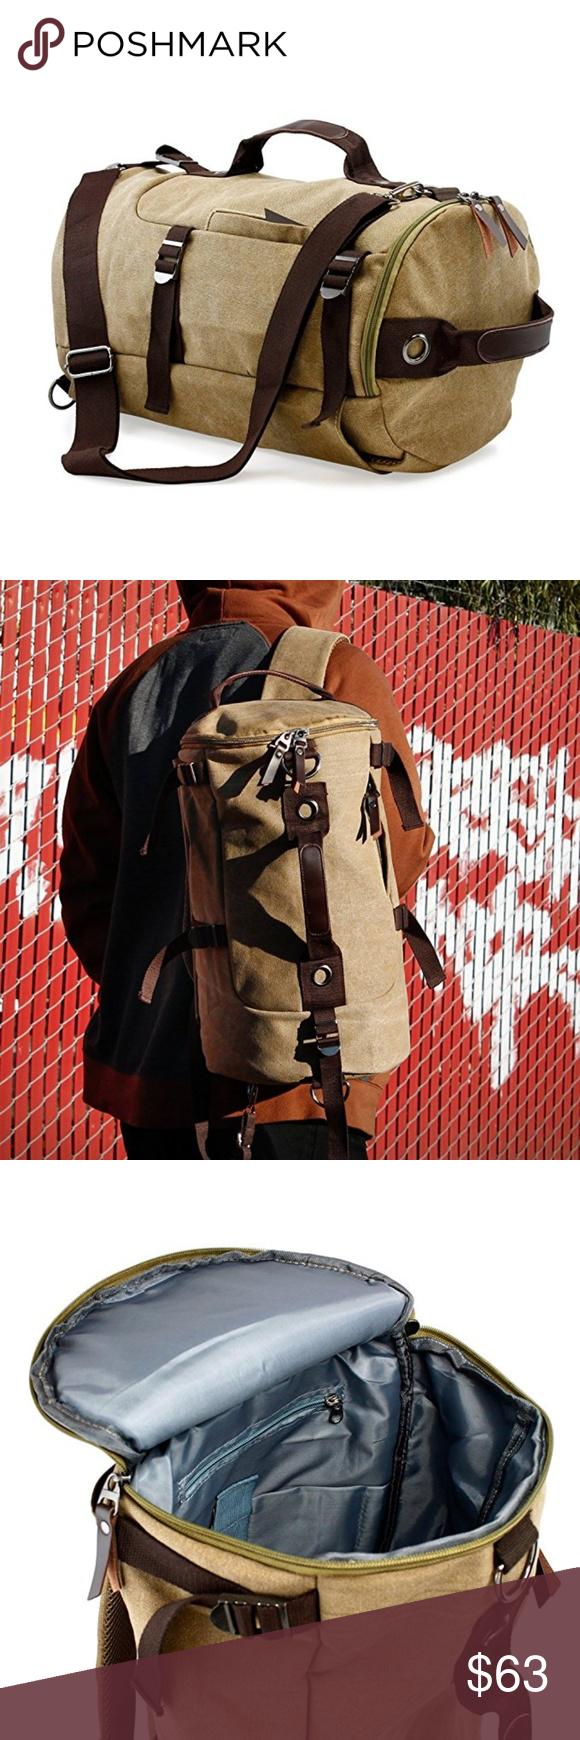 3b0b690da3 Large Duffel Travel Canvas Bag Handbag Backpack Large Duffel Travel Canvas  Bag Handbag Backpack DIMENSION